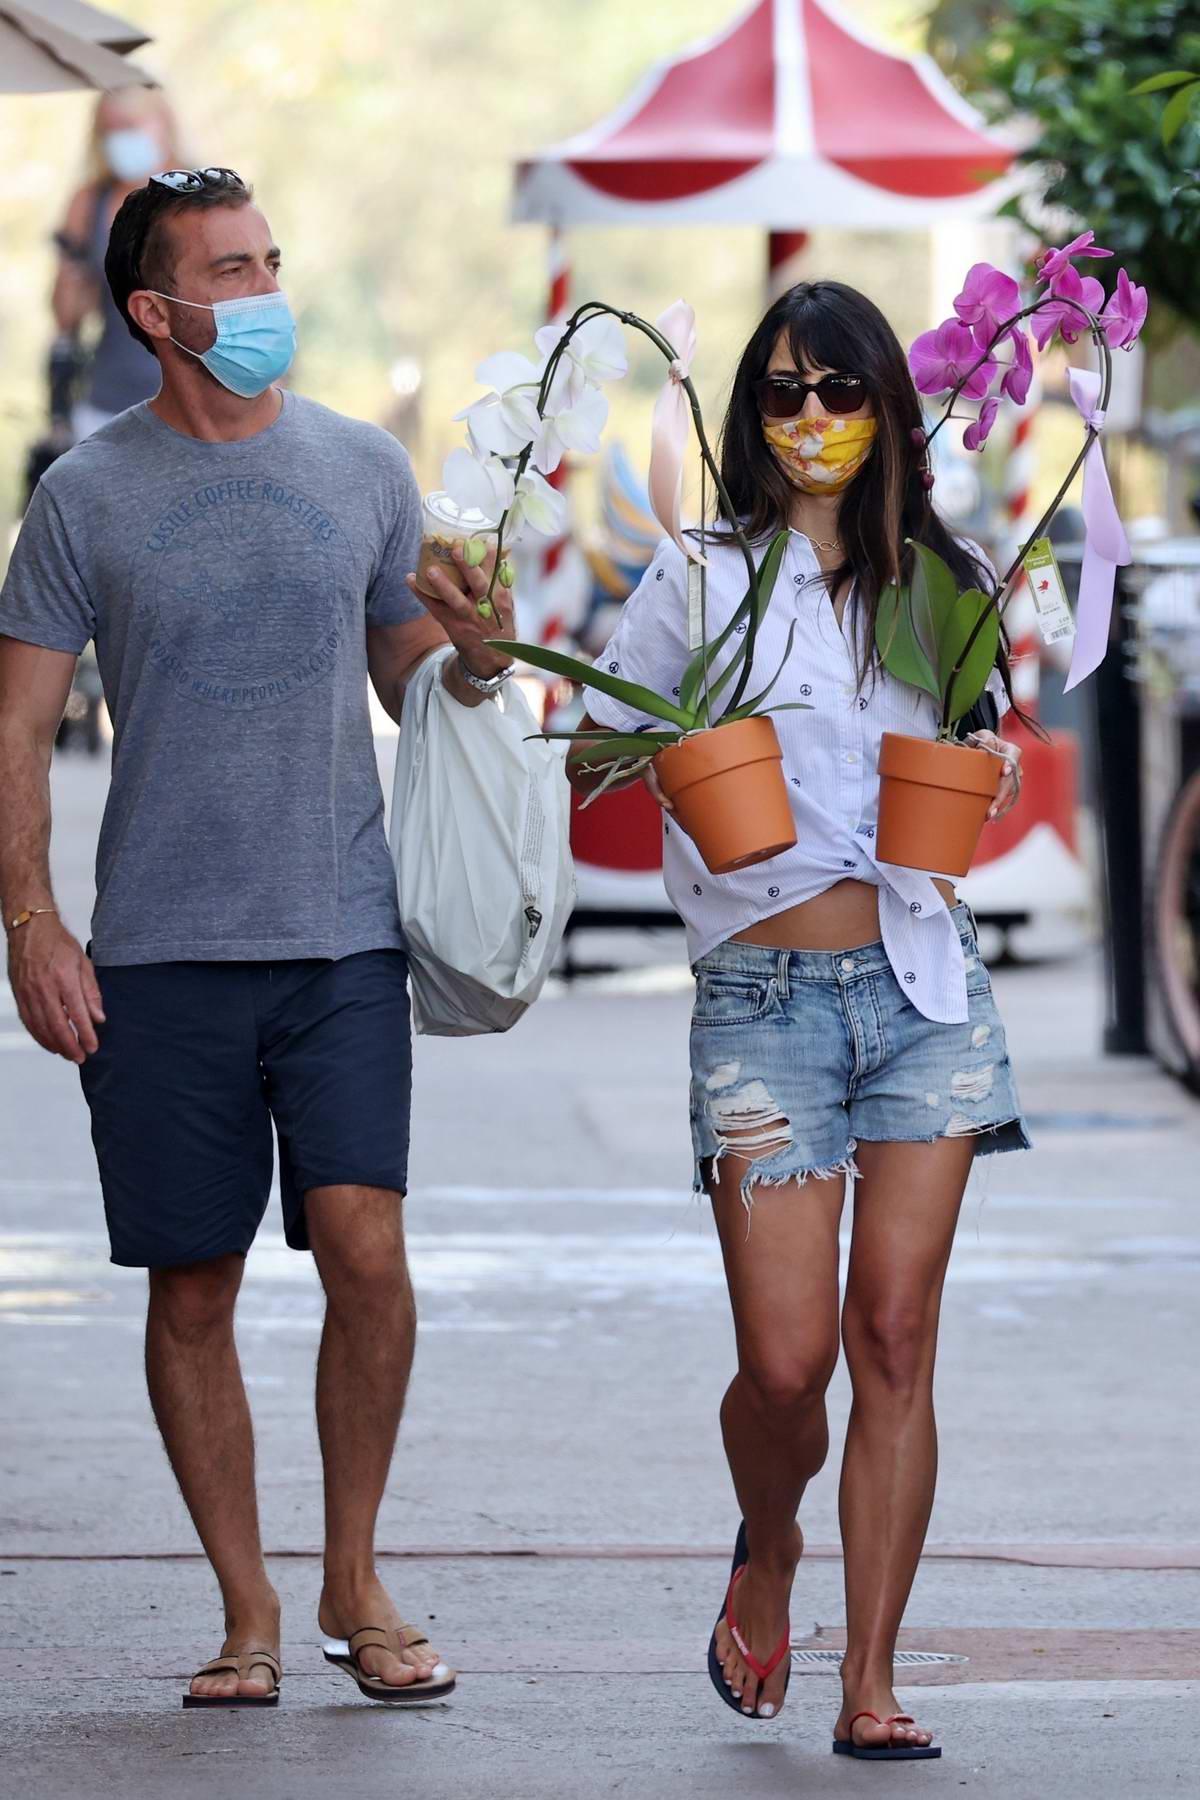 Jordana Brewster picks up some Orchids during a coffee run with boyfriend Mason Morfit in Santa Monica, California